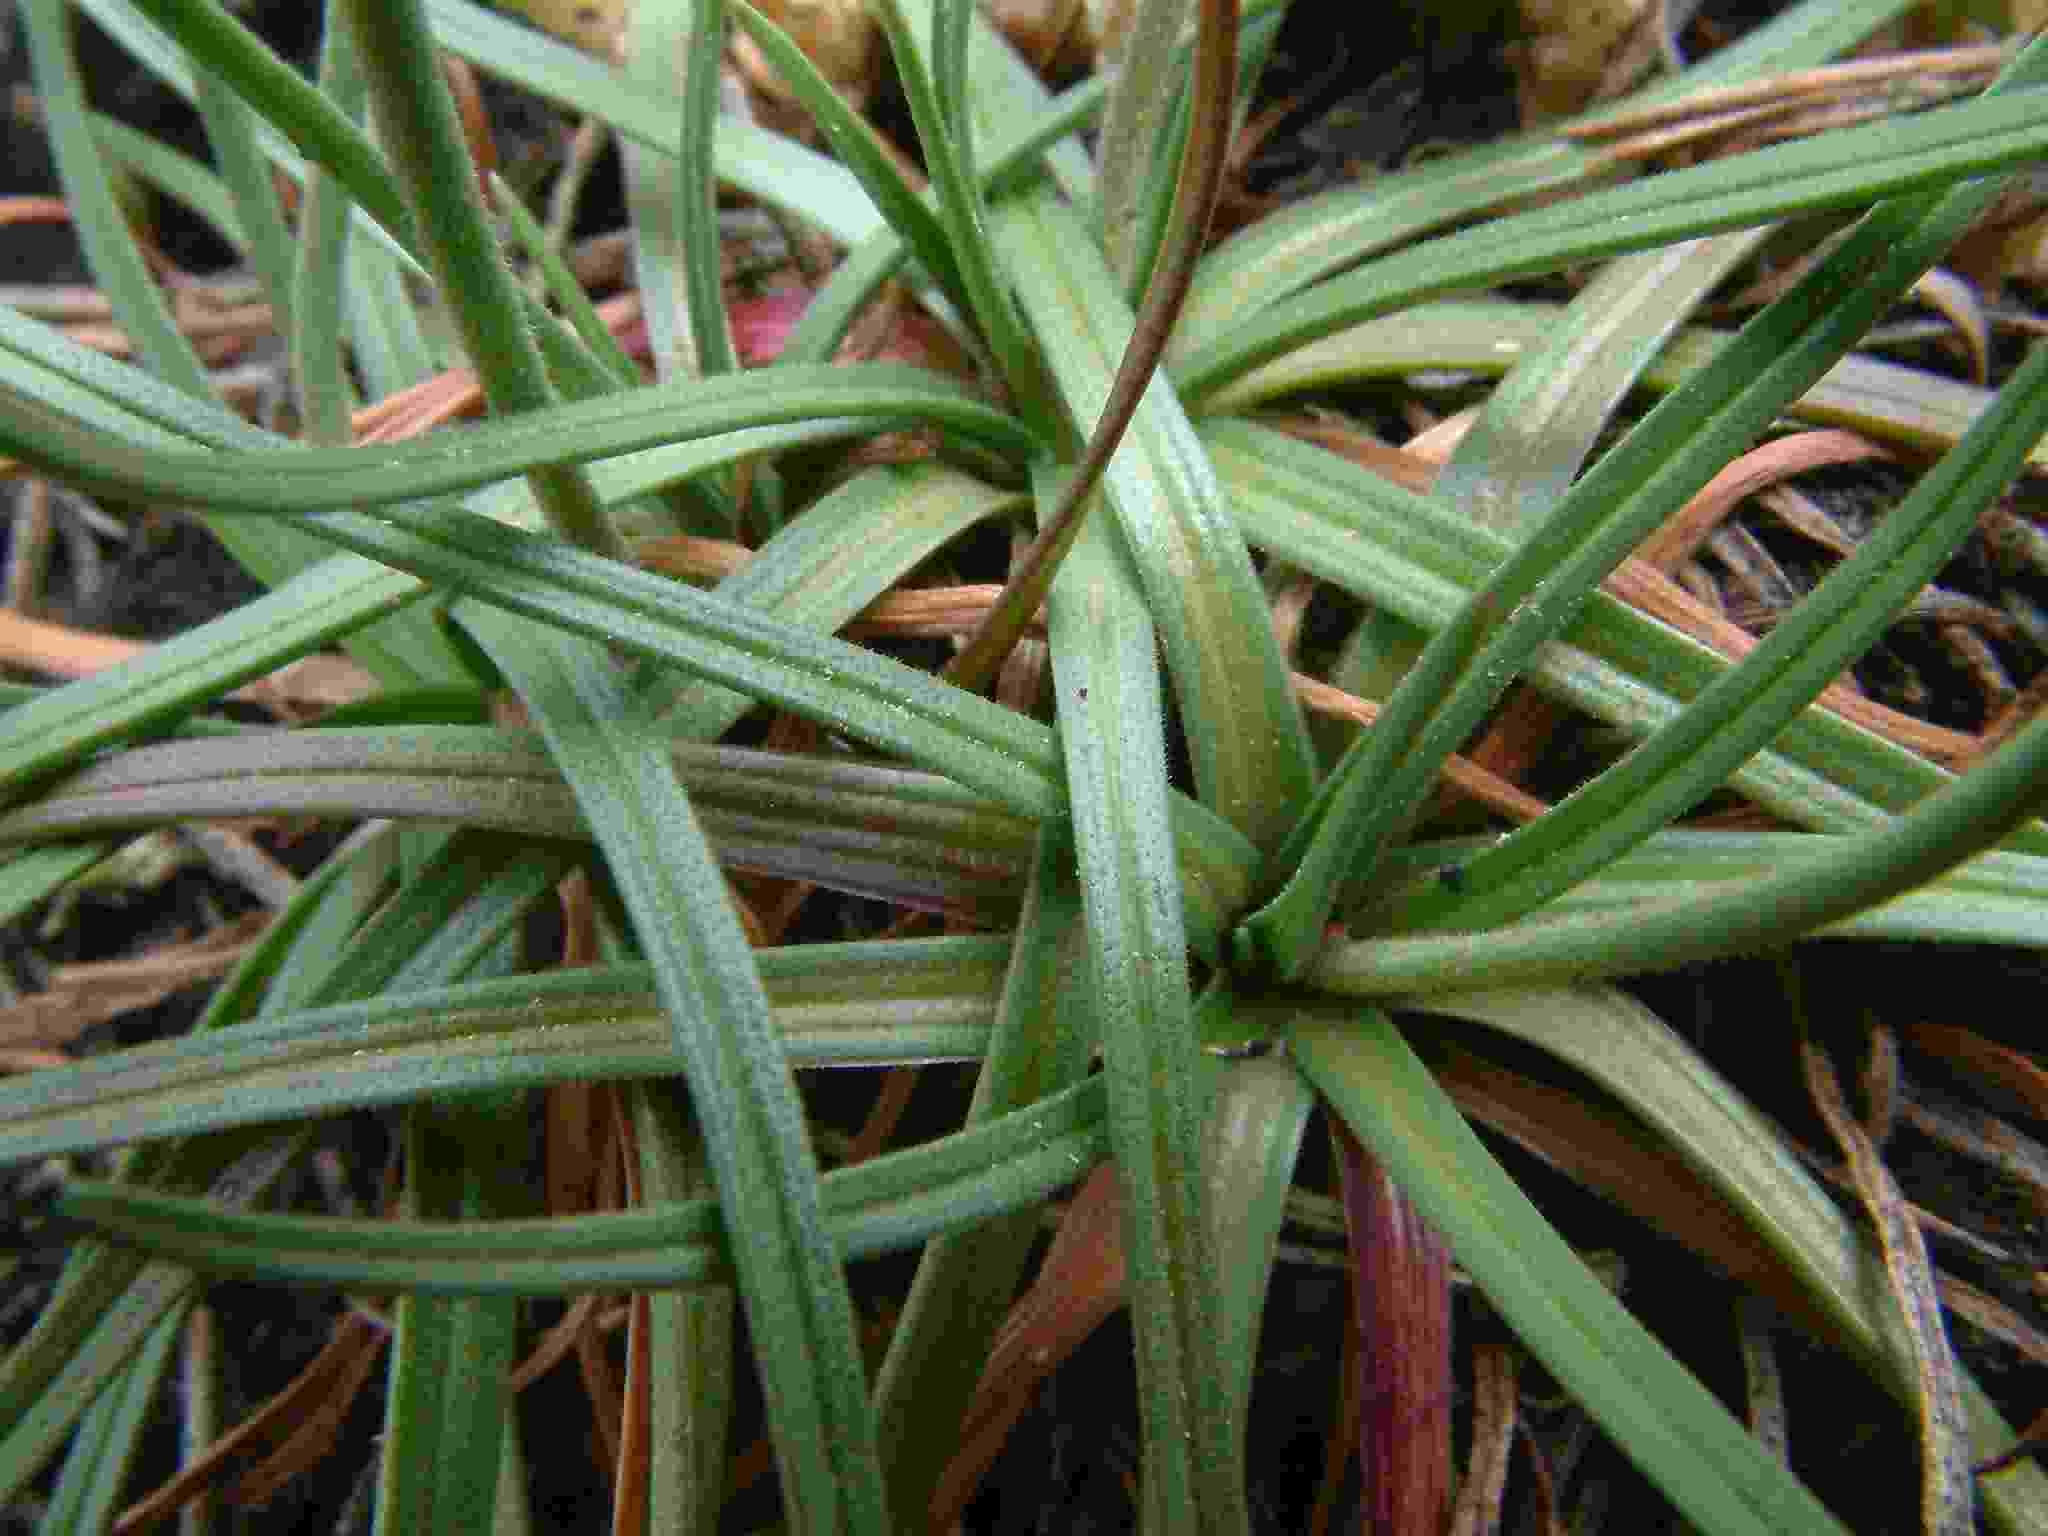 Armeria maritima ssp. serpentini 3